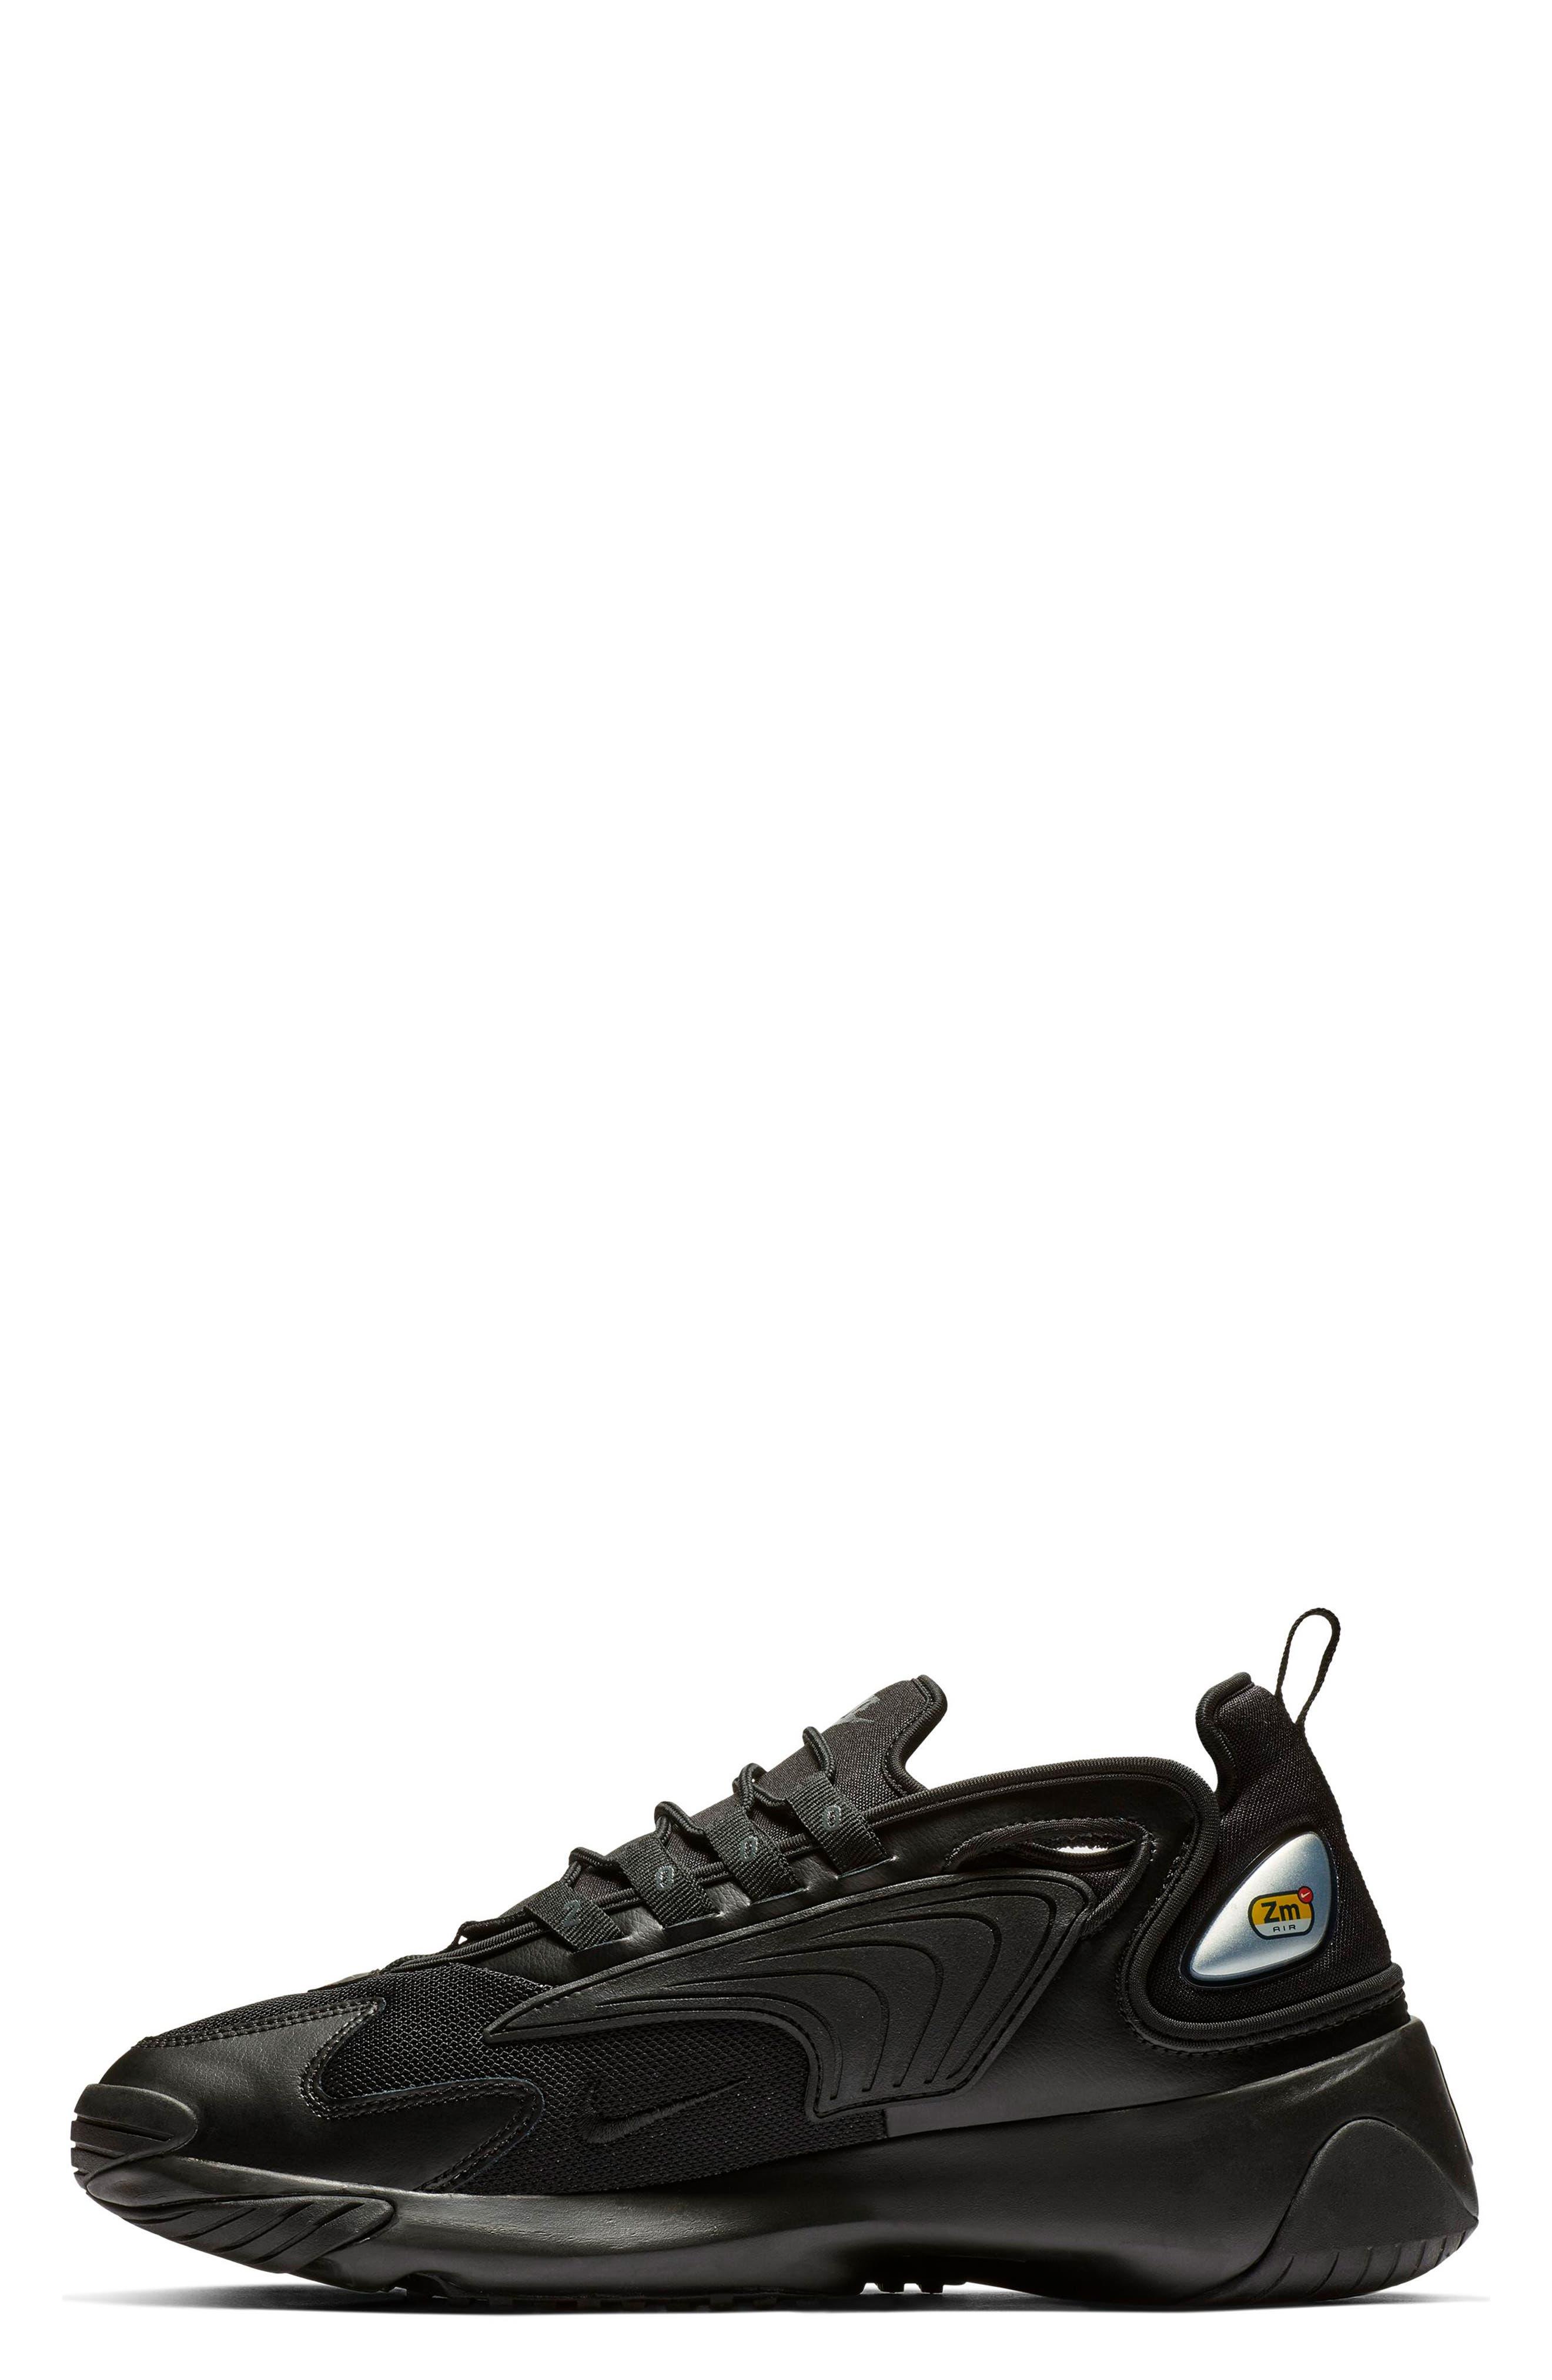 Zoom 2K Sneaker,                             Alternate thumbnail 3, color,                             BLACK/ BLACK/ ANTHRACITE